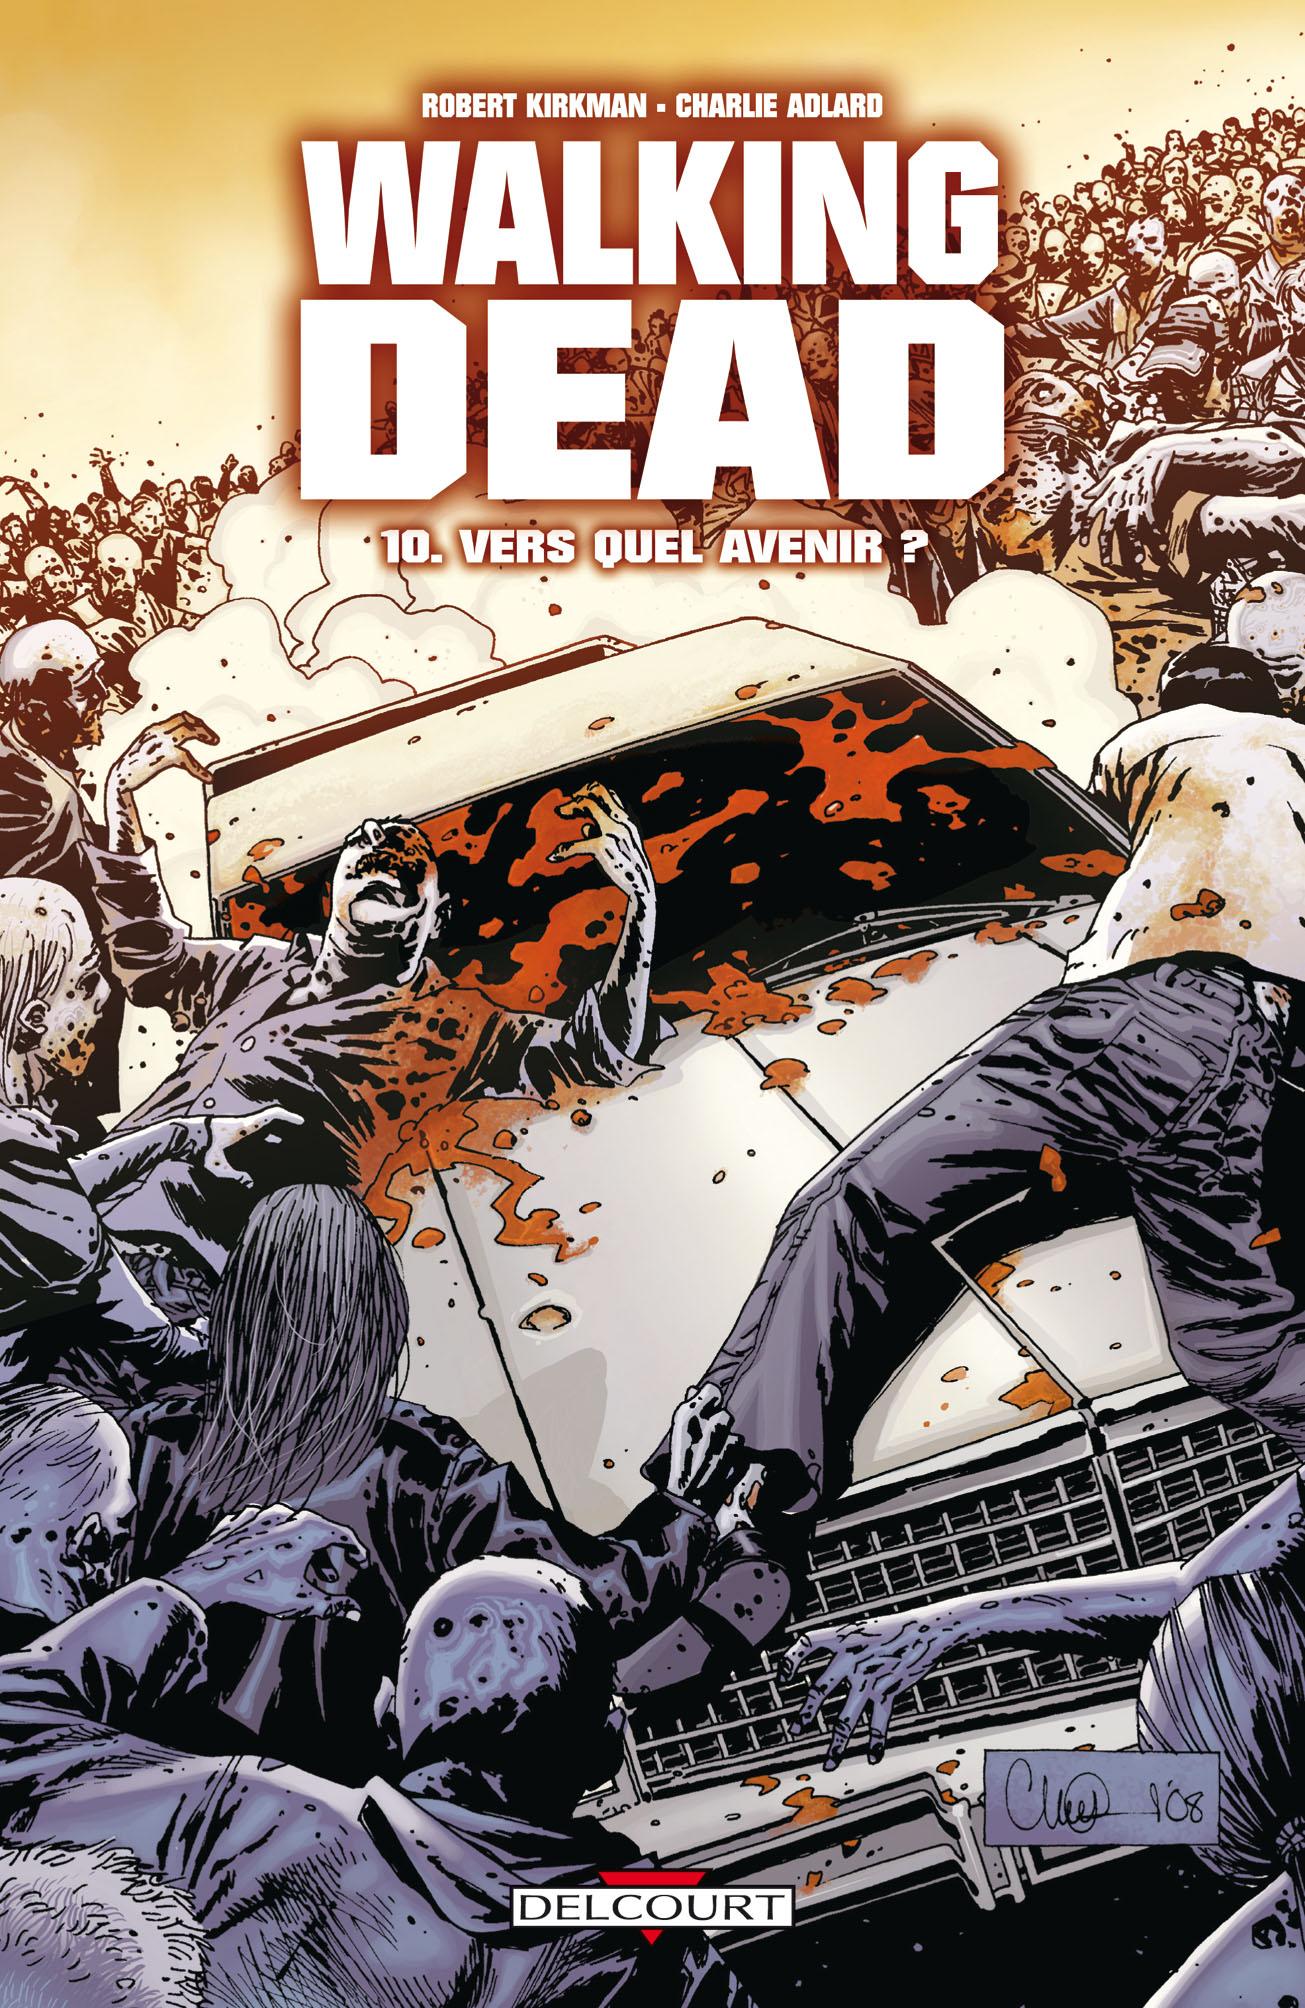 Walking Dead 10 - Vers quel avenir ?